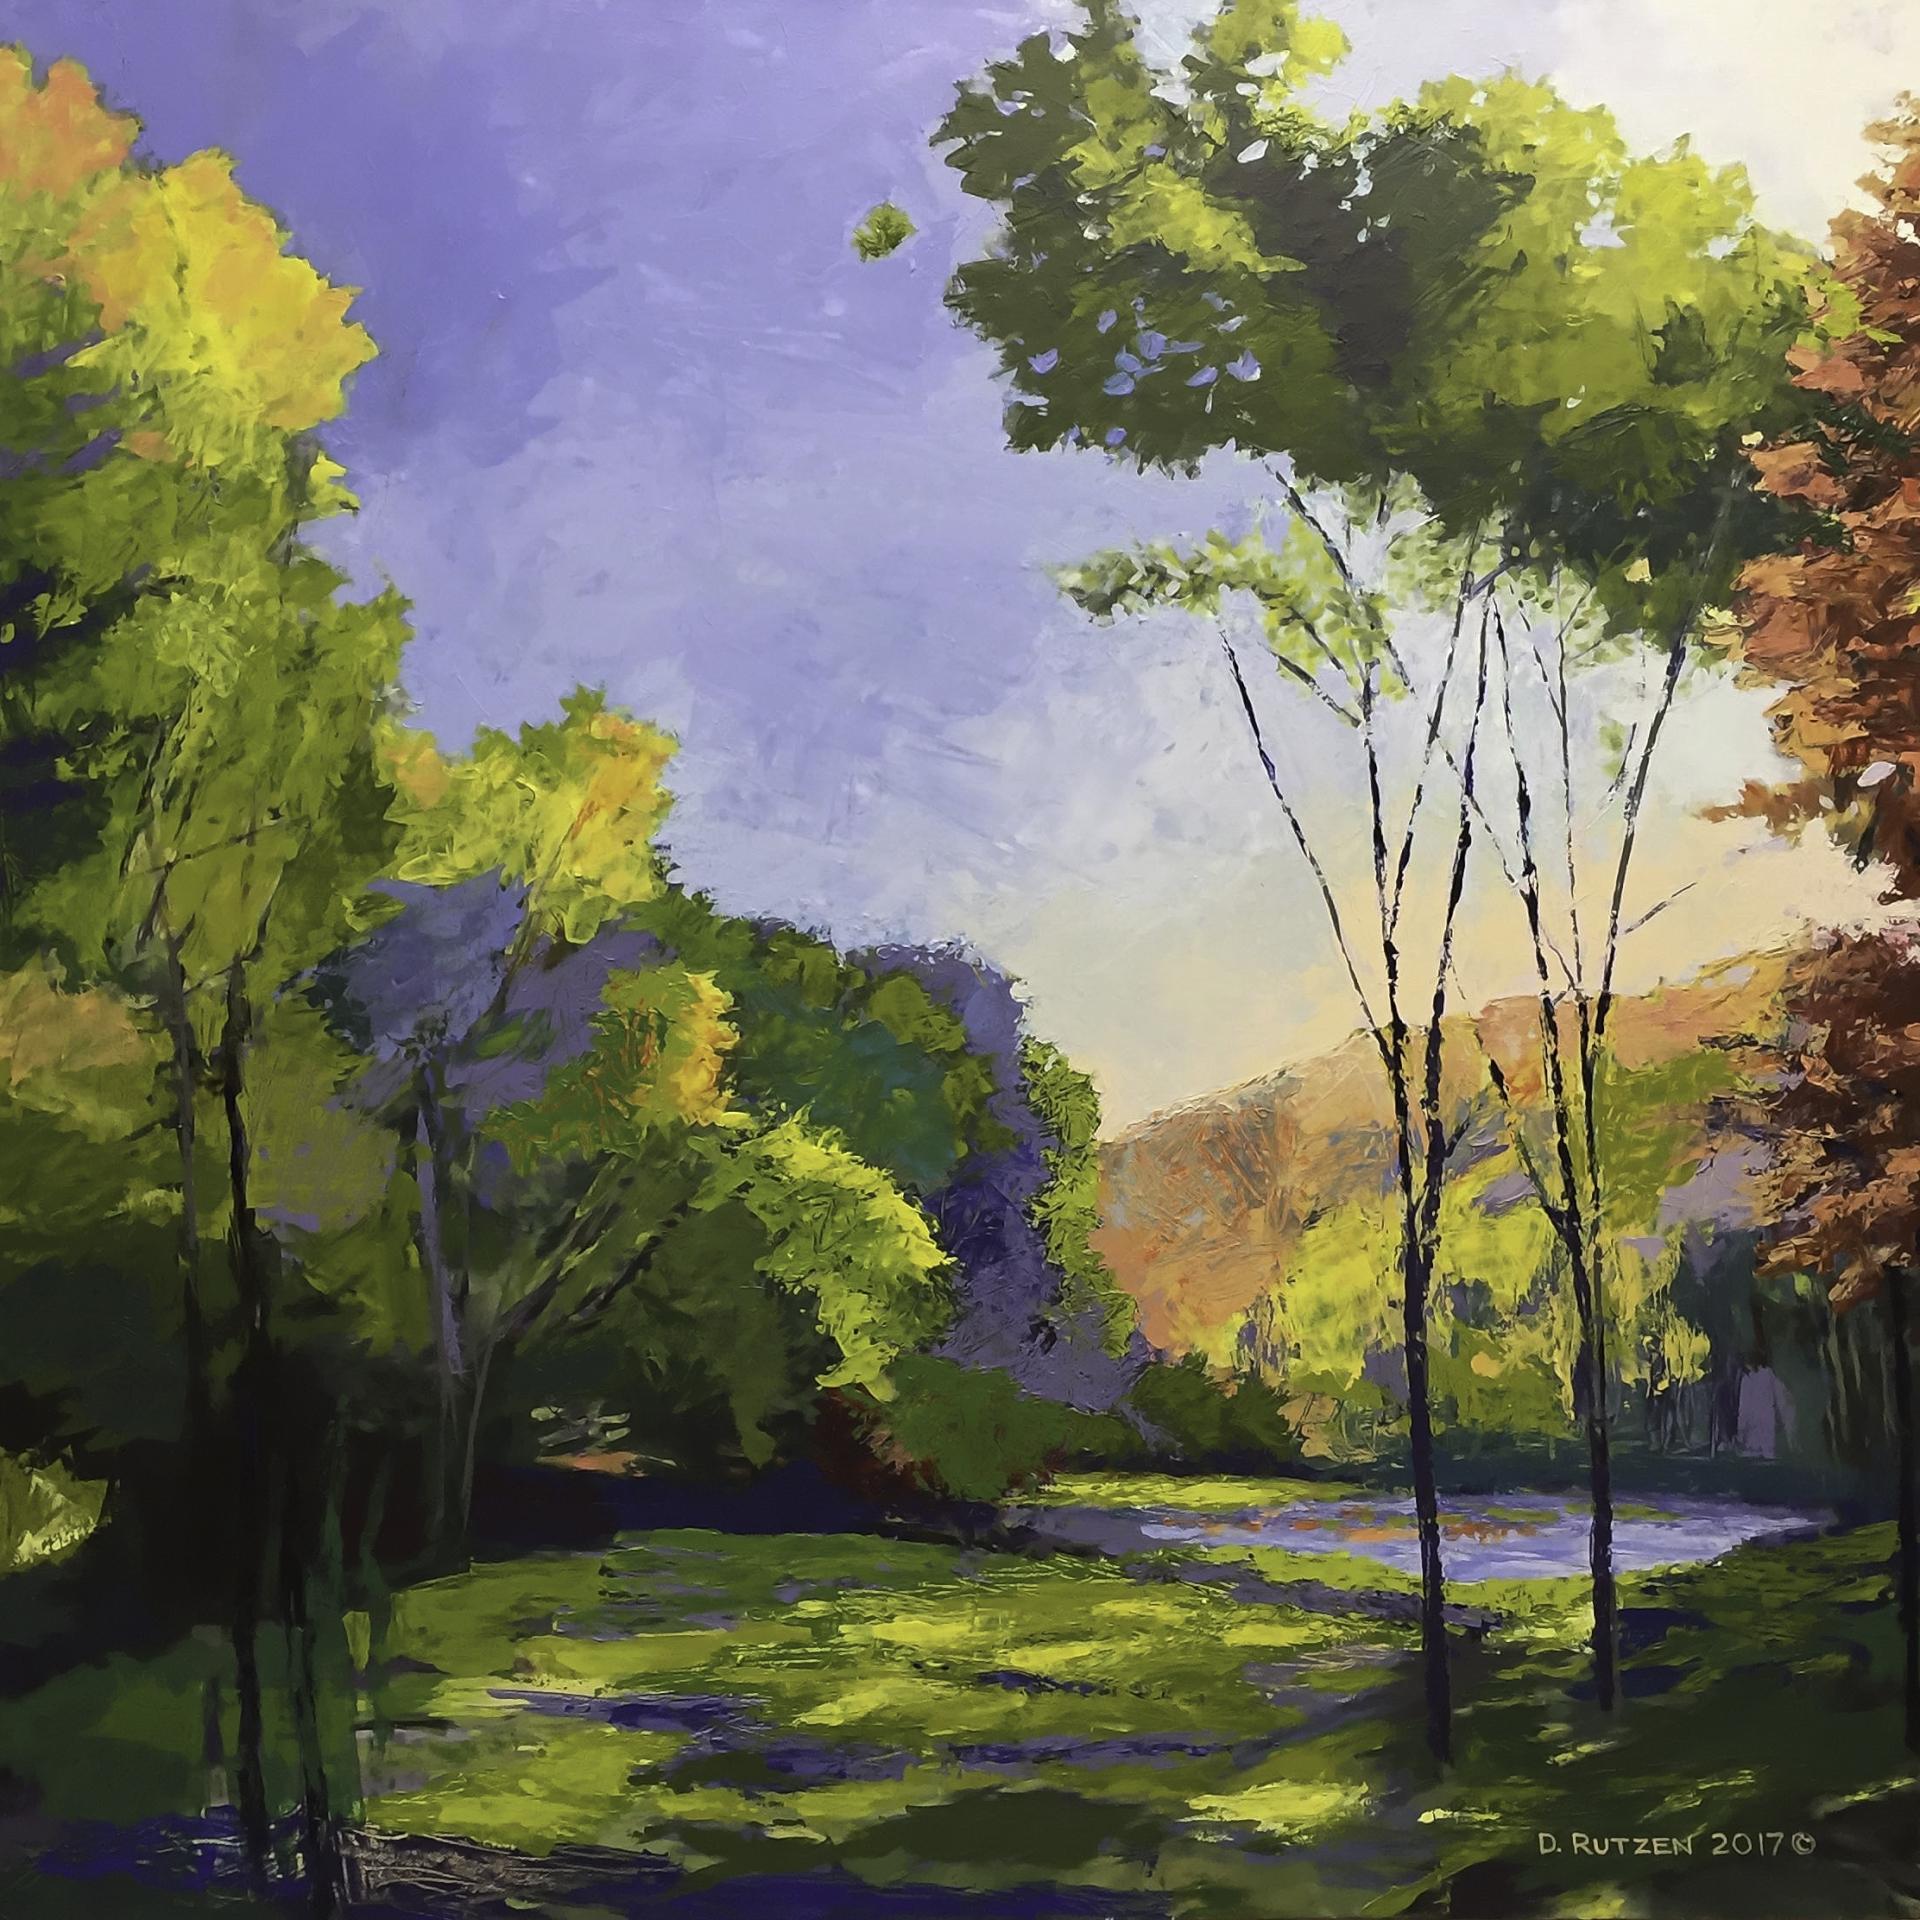 DOUGLAS RUTZEN  - Blandinsville, IL   Pocket Pond   acrylic on canvas, $1,000